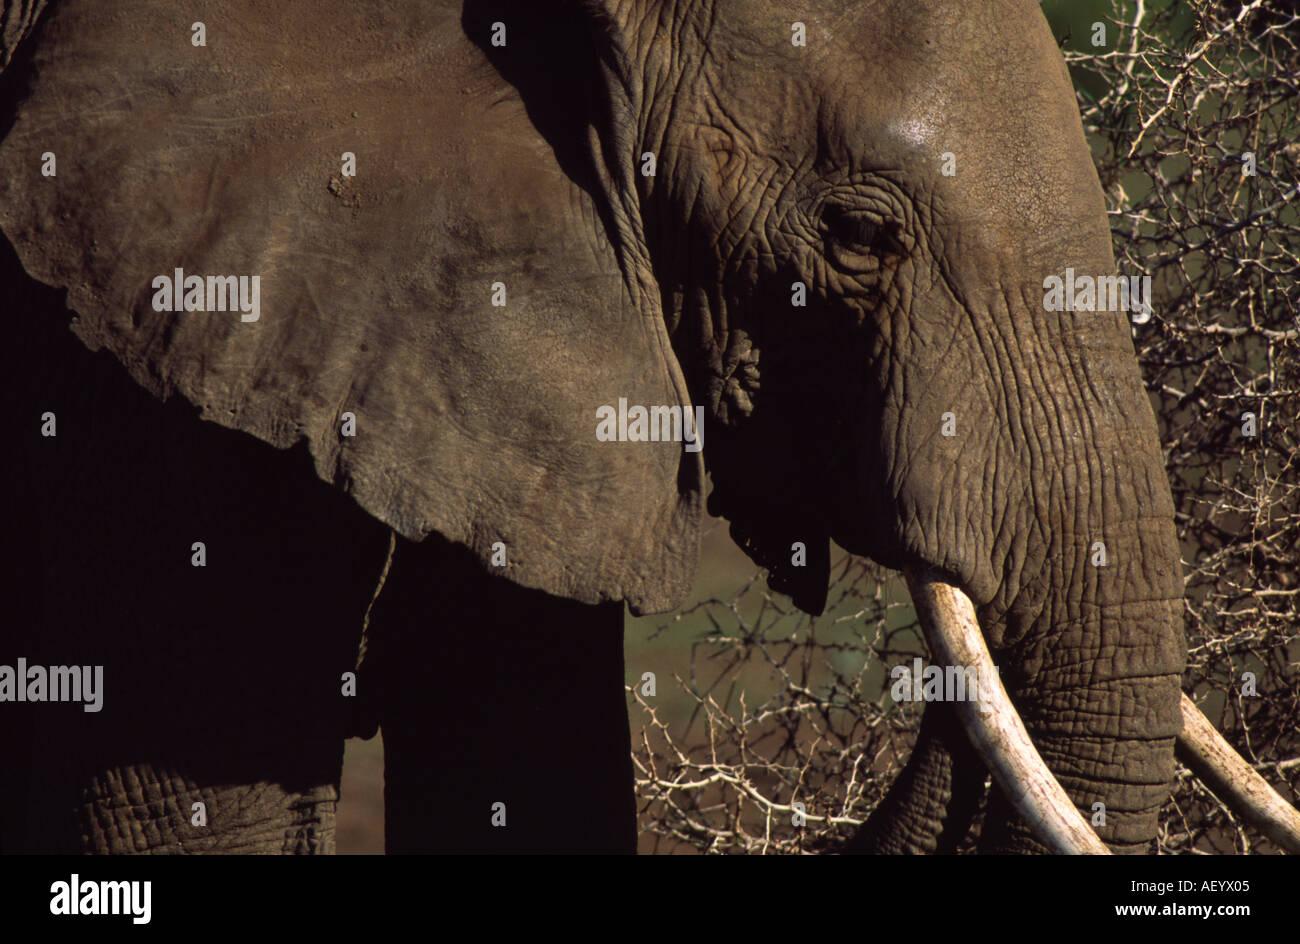 African Elephant Lake Manyara National Park Tanzania - Stock Image